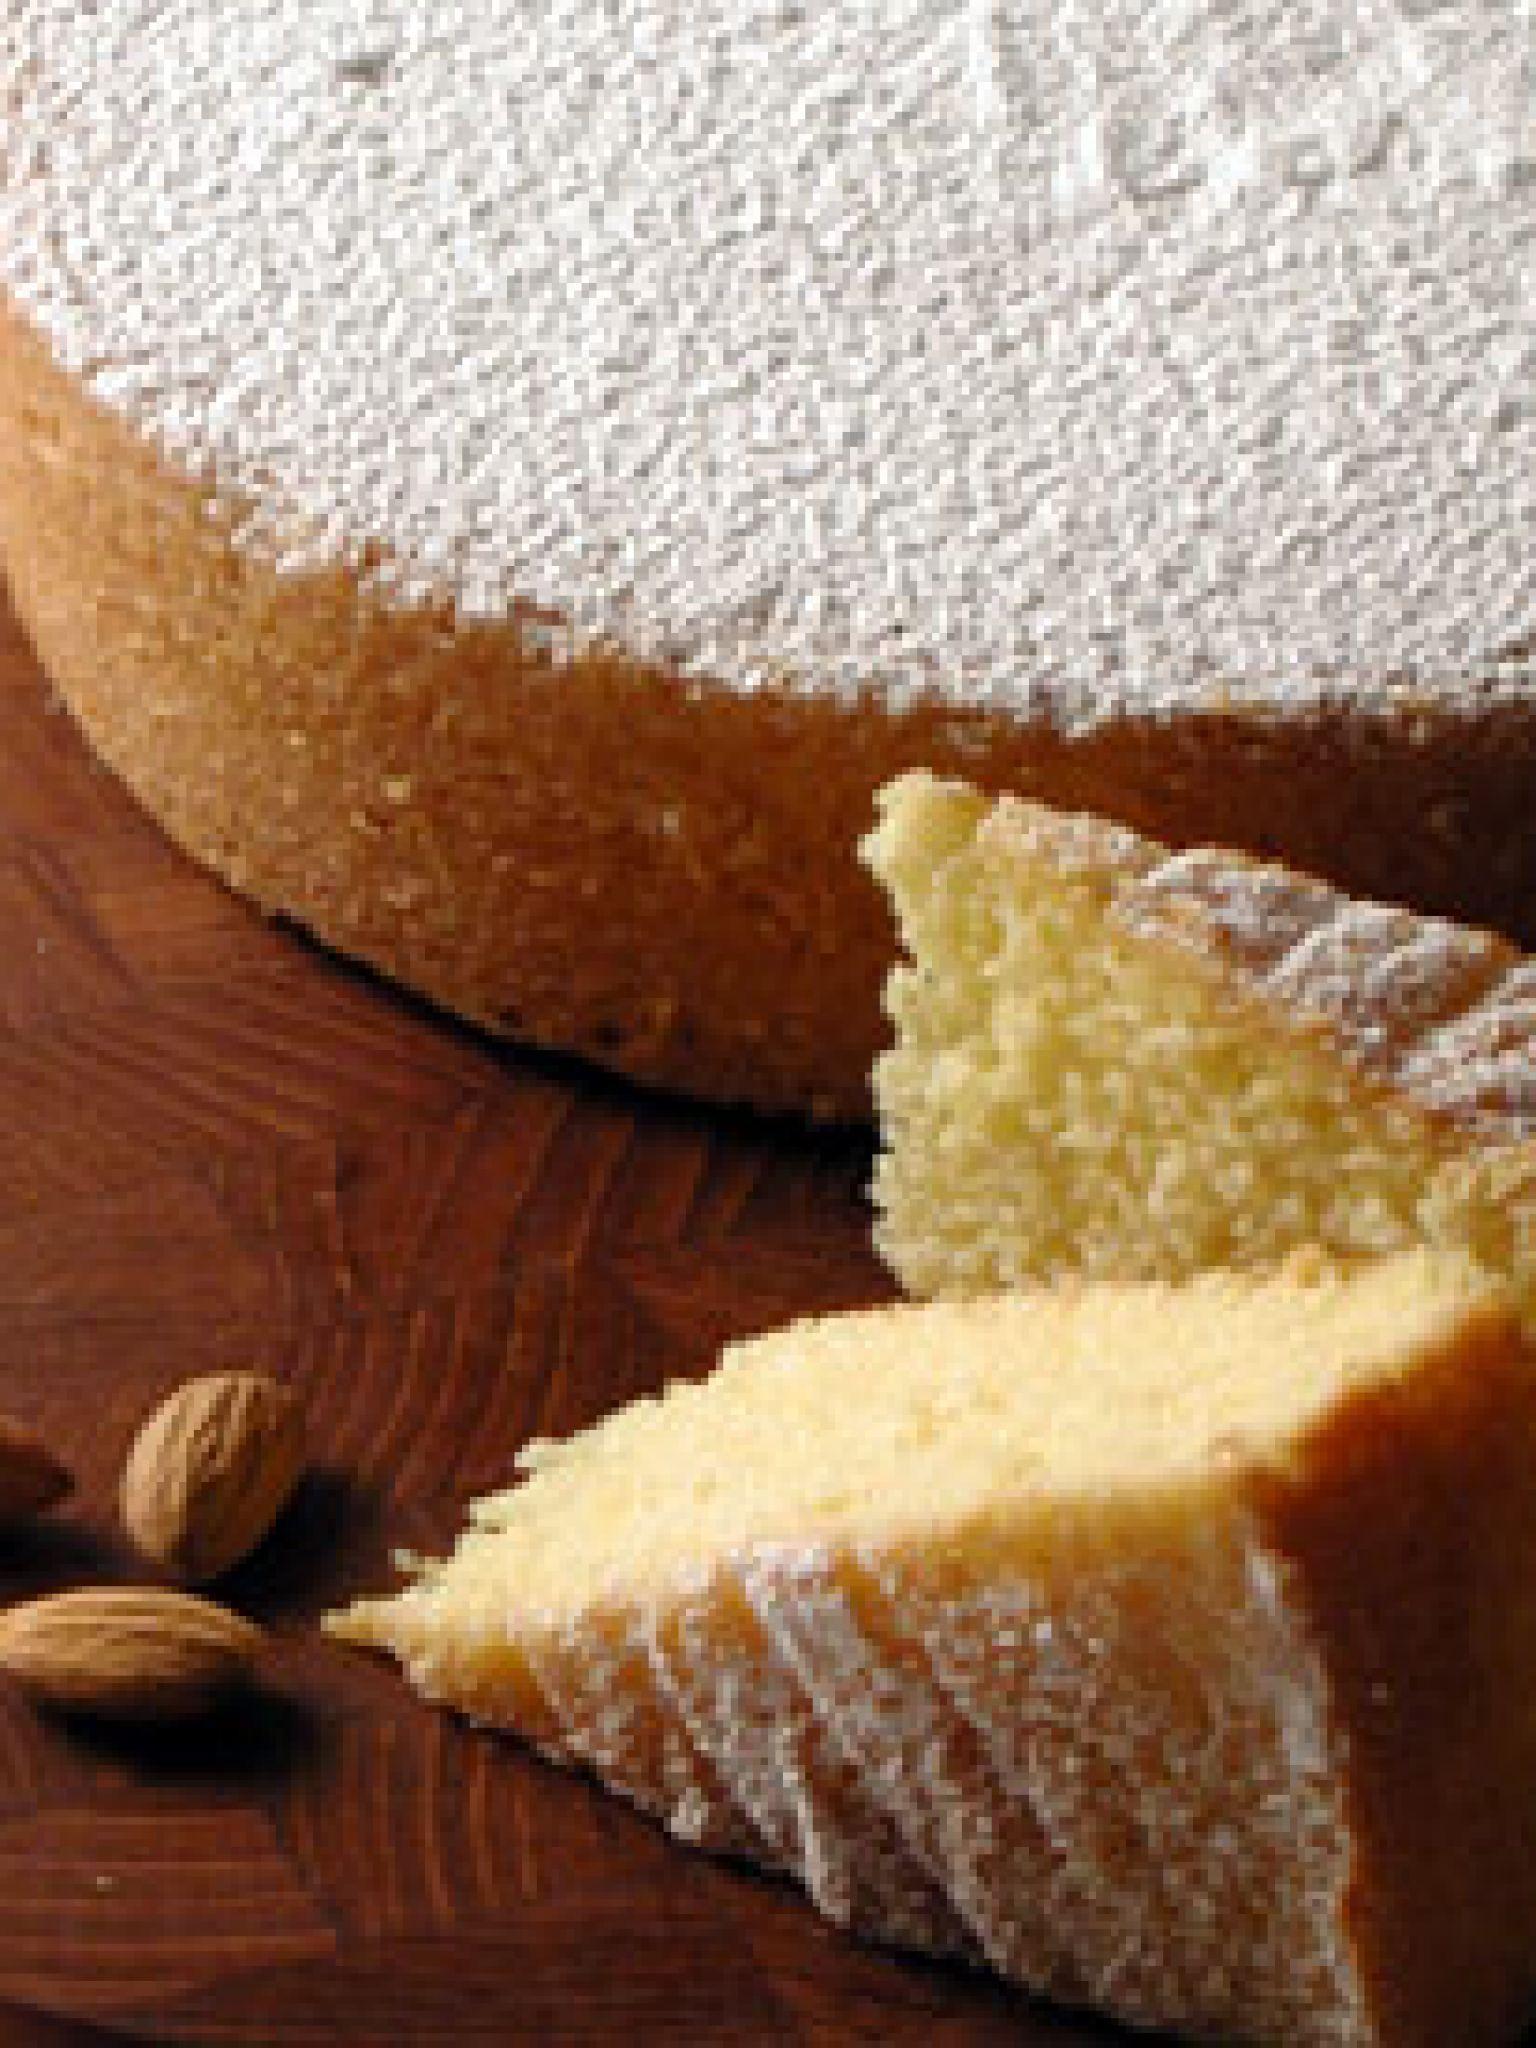 Almond cake recipe giada de laurentiis almond cakes and almonds forumfinder Gallery